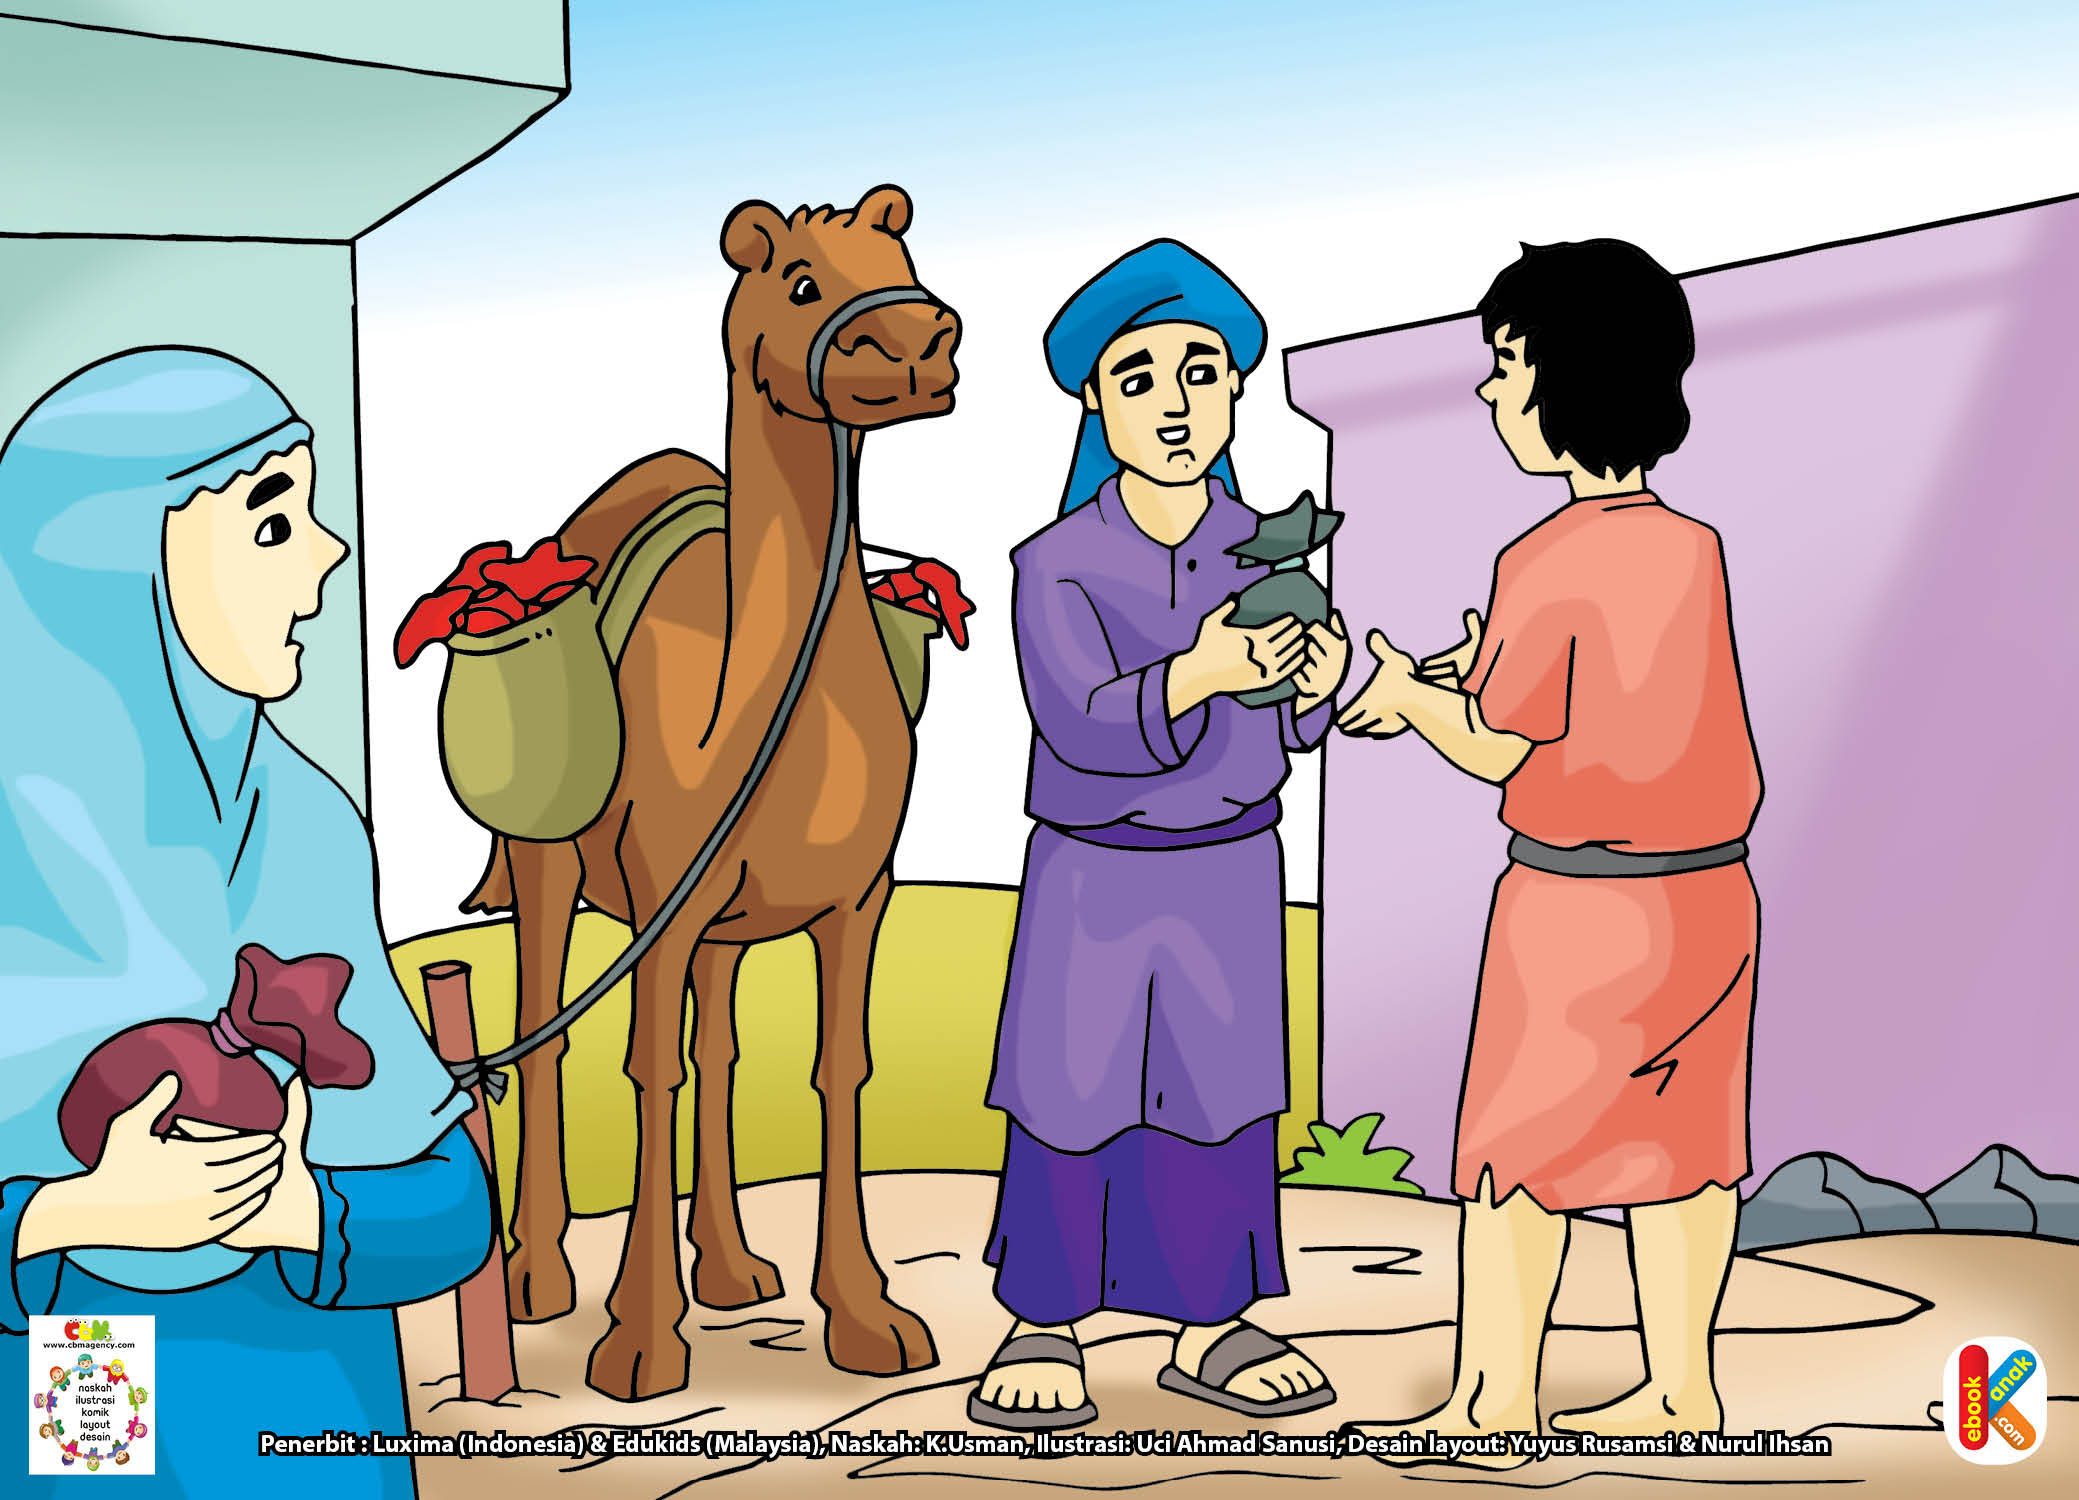 Ayahnya bernama Utsman Abu Quhafah bin Amir.